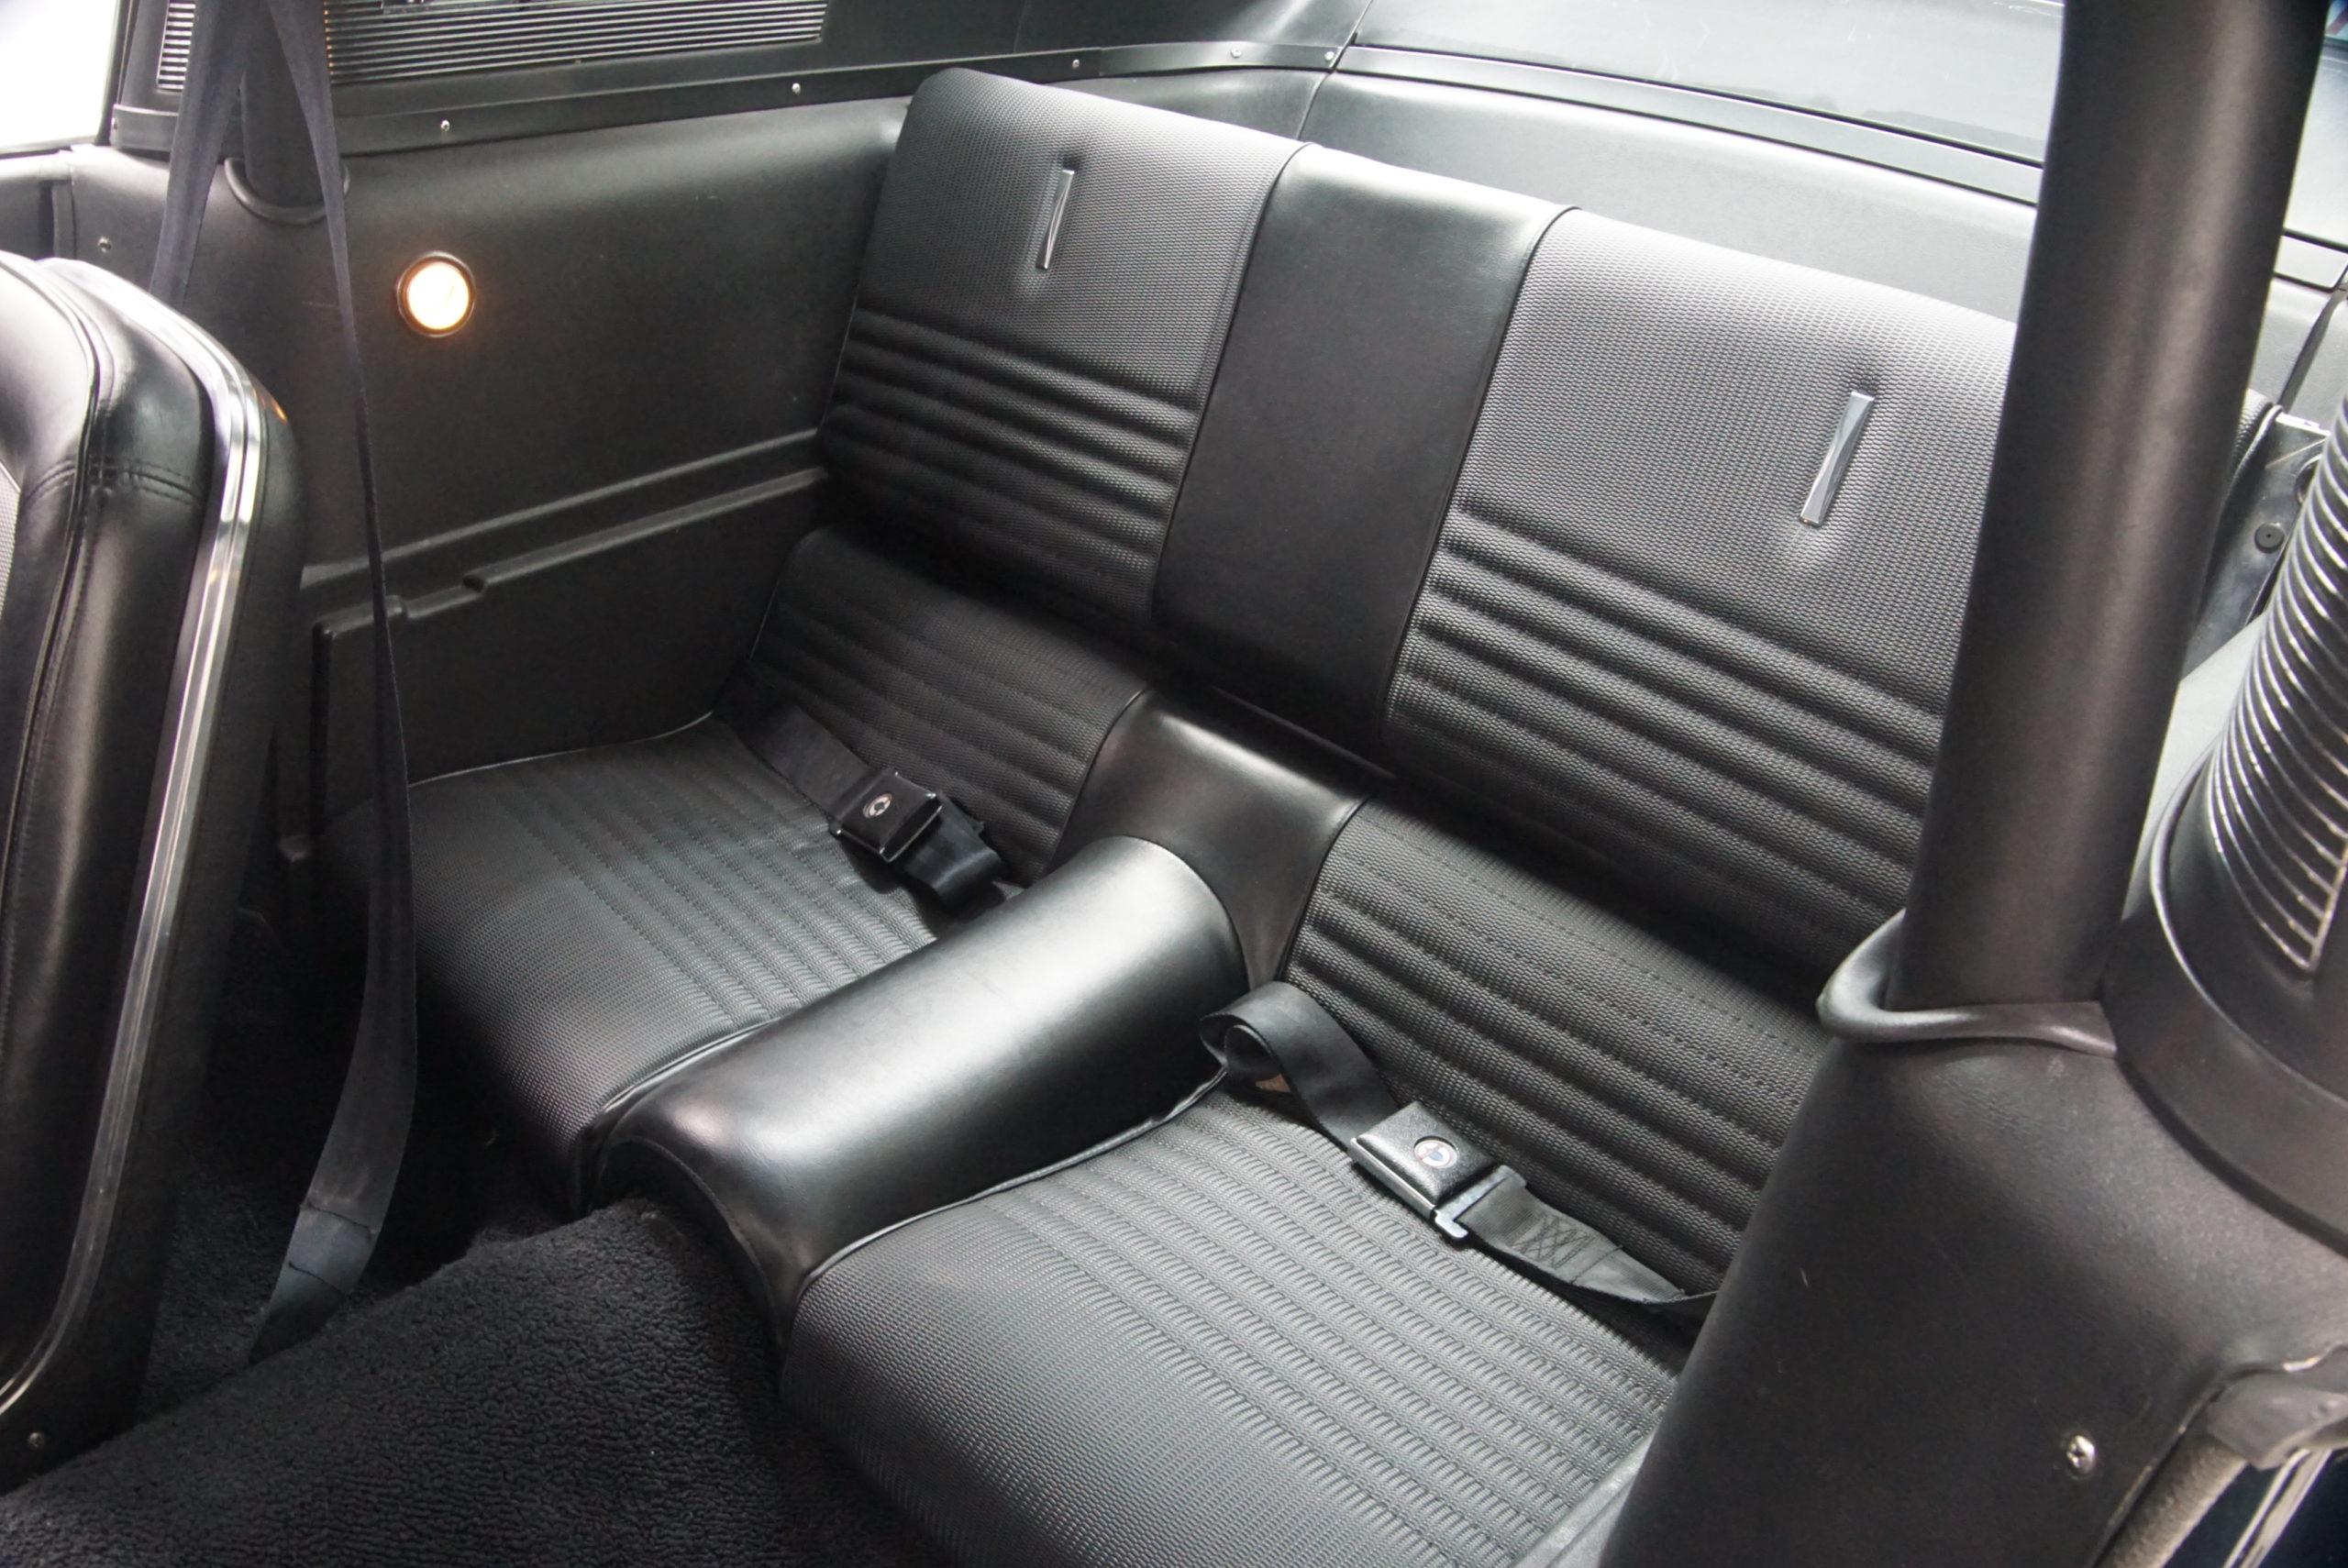 1967 Shelby Mustang GT350 Fastback intérieur banquette arrière - Shannons Auctions avril 2021.